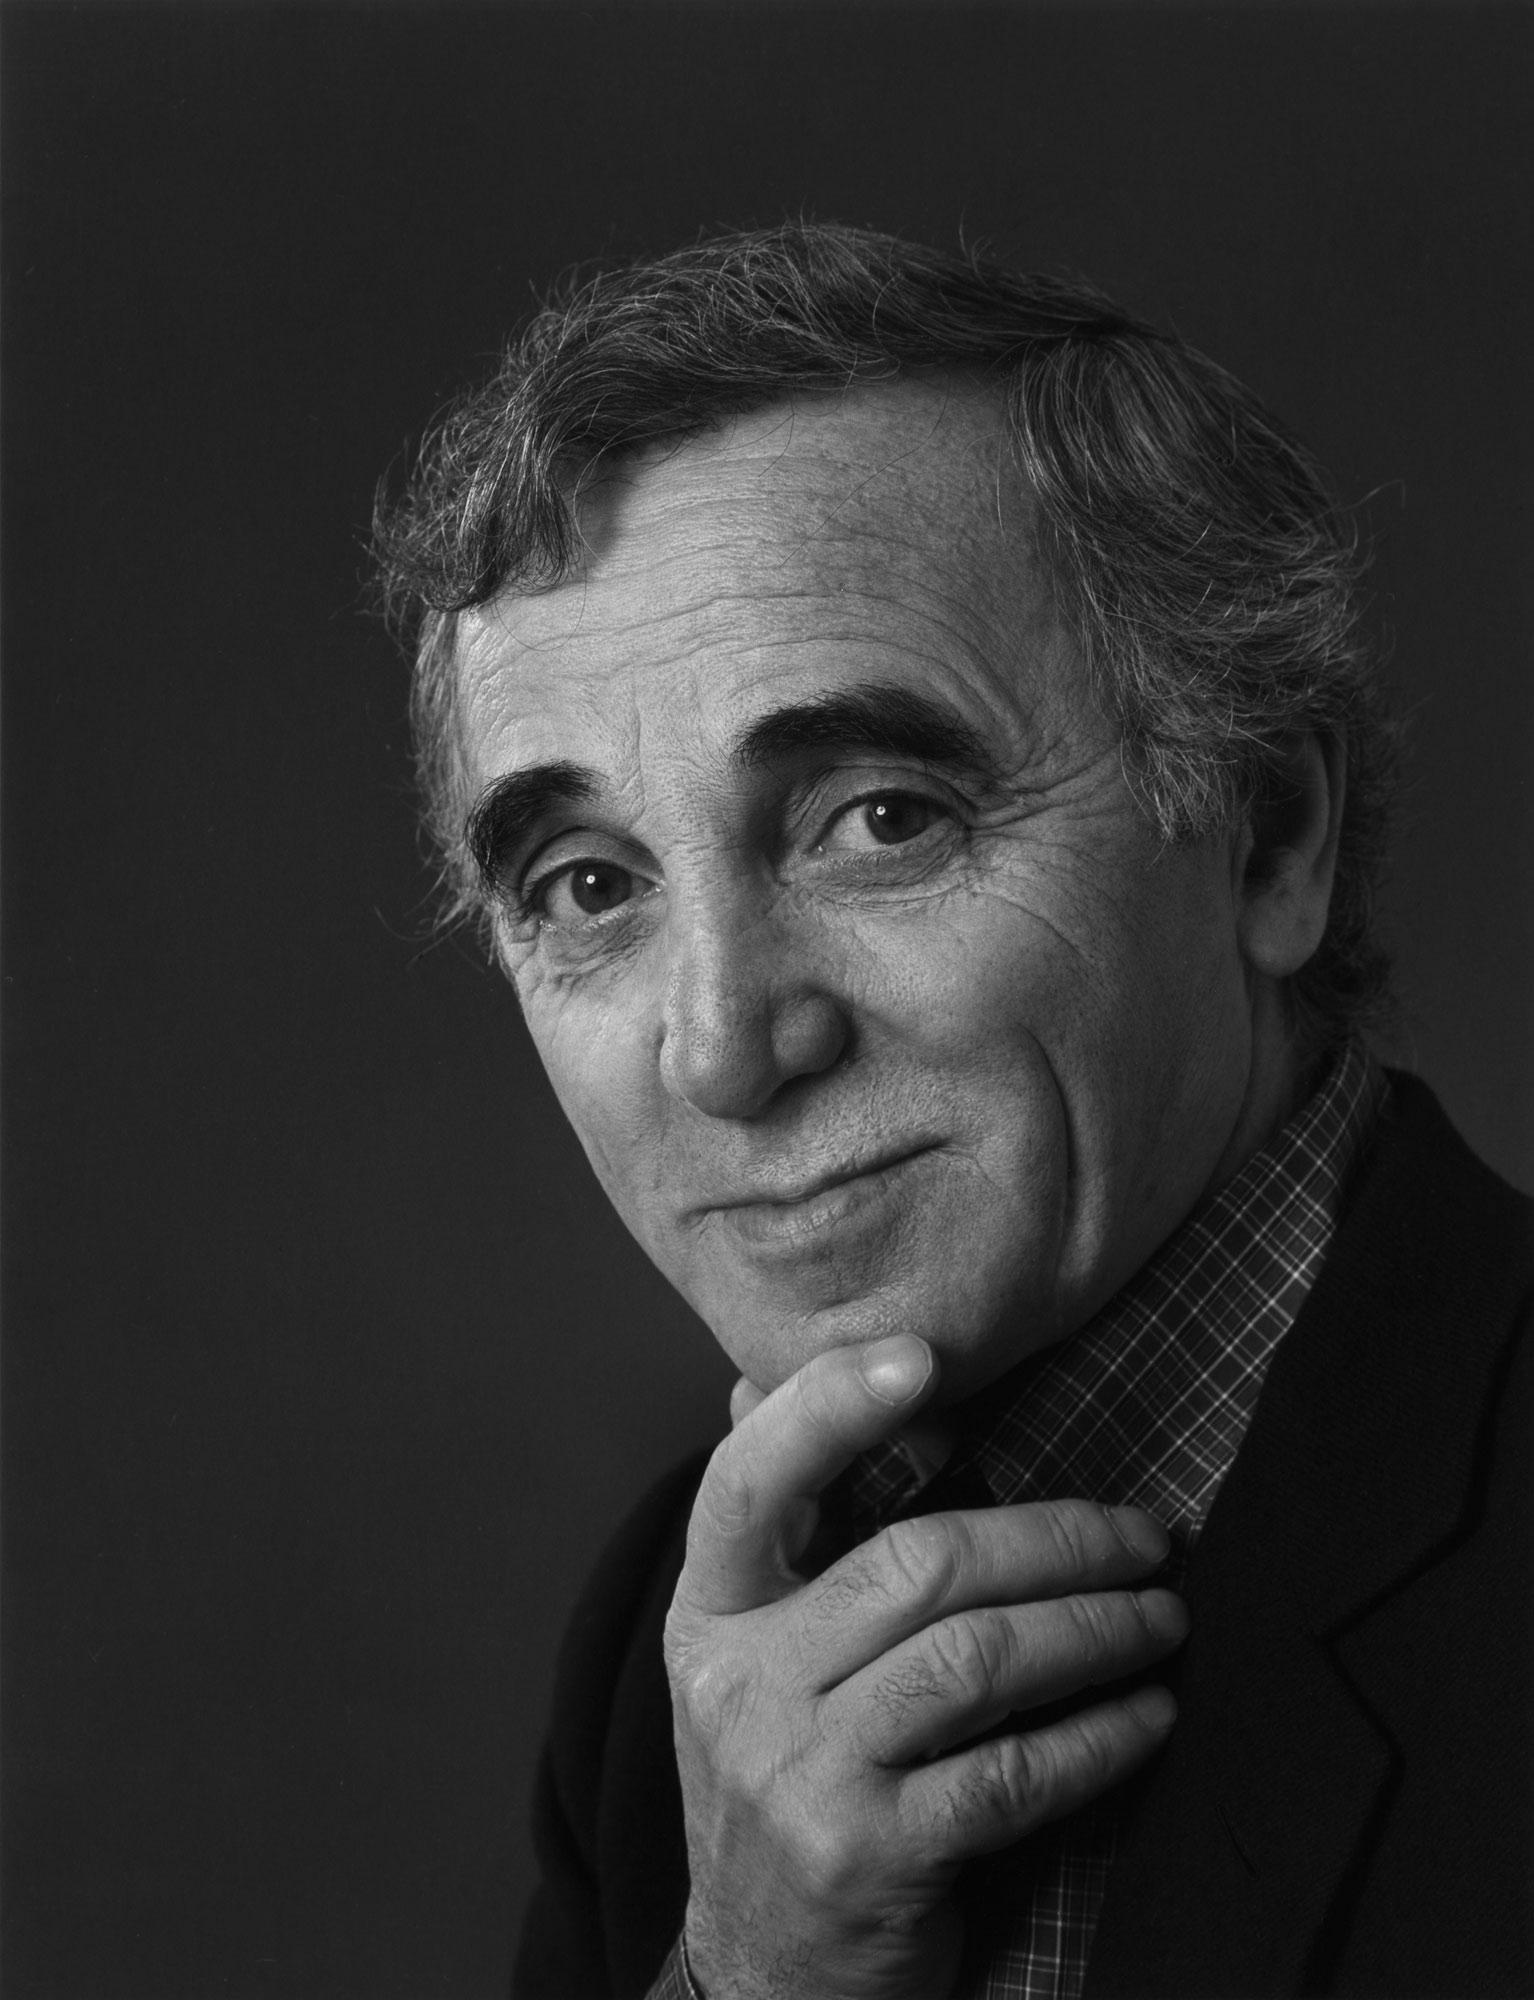 Charles Aznavour, 1924-2018 – Yousuf Karsh